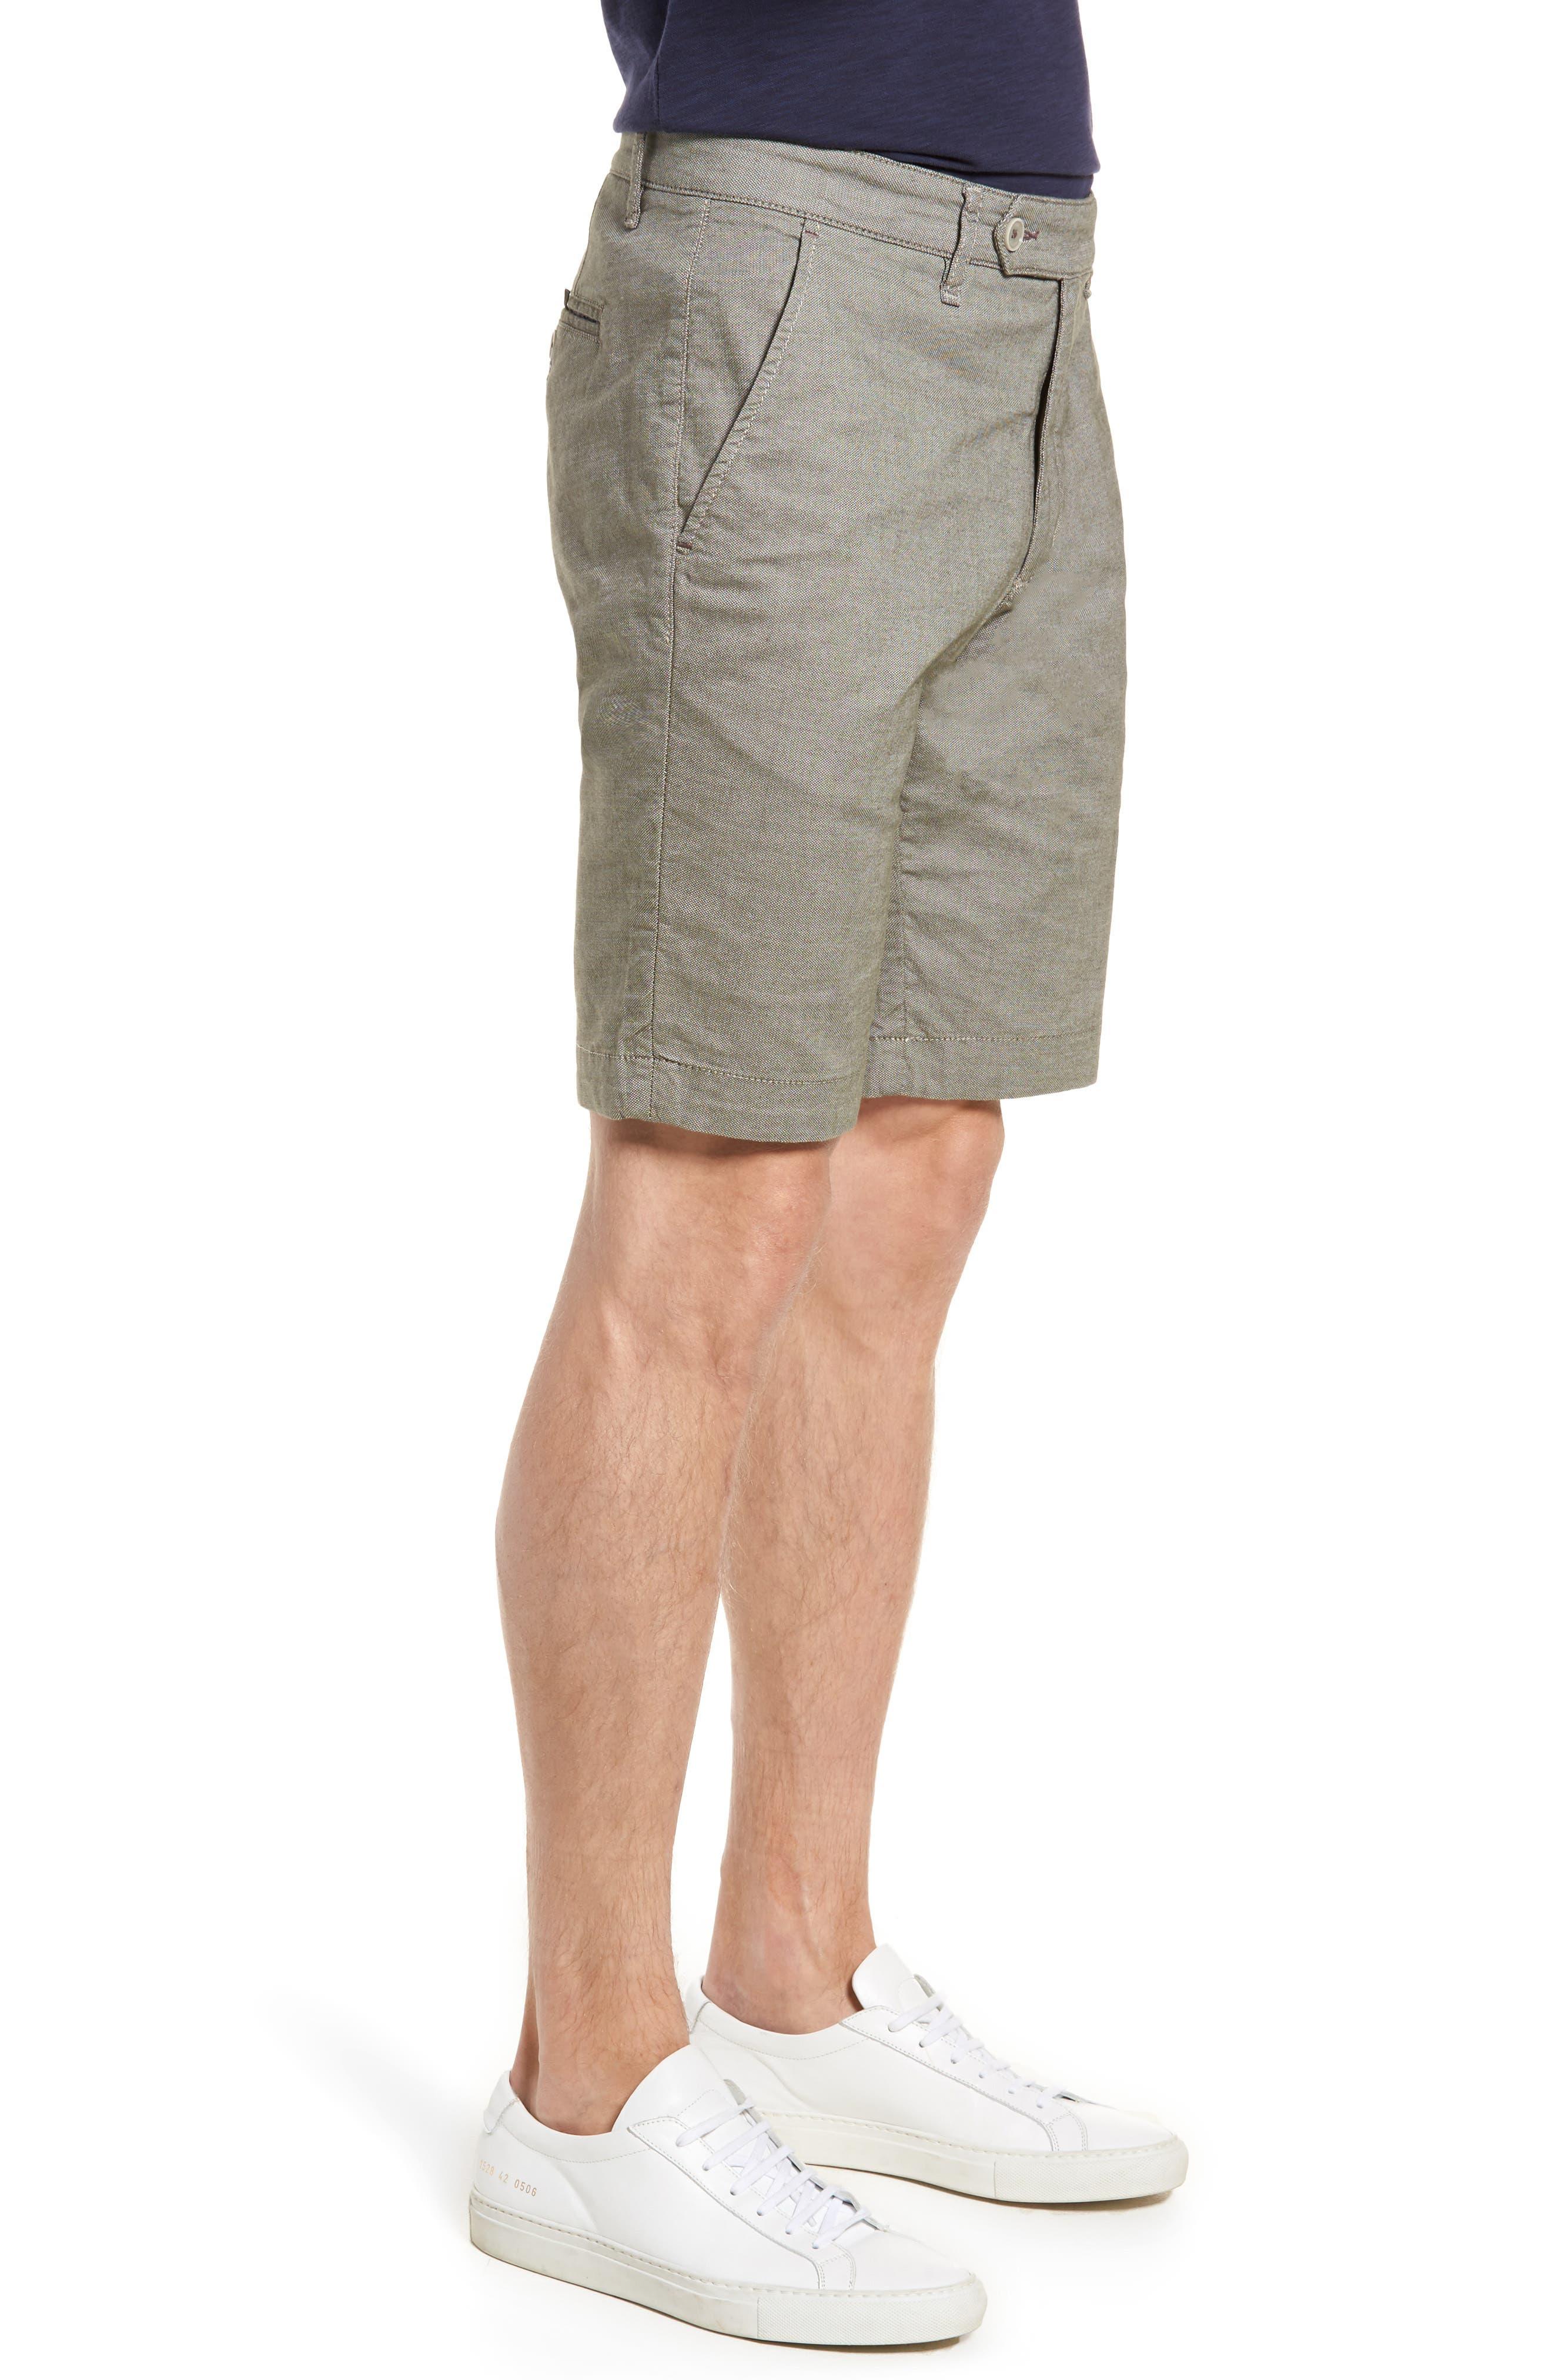 Herbosh Shorts,                             Alternate thumbnail 3, color,                             GREY MARL